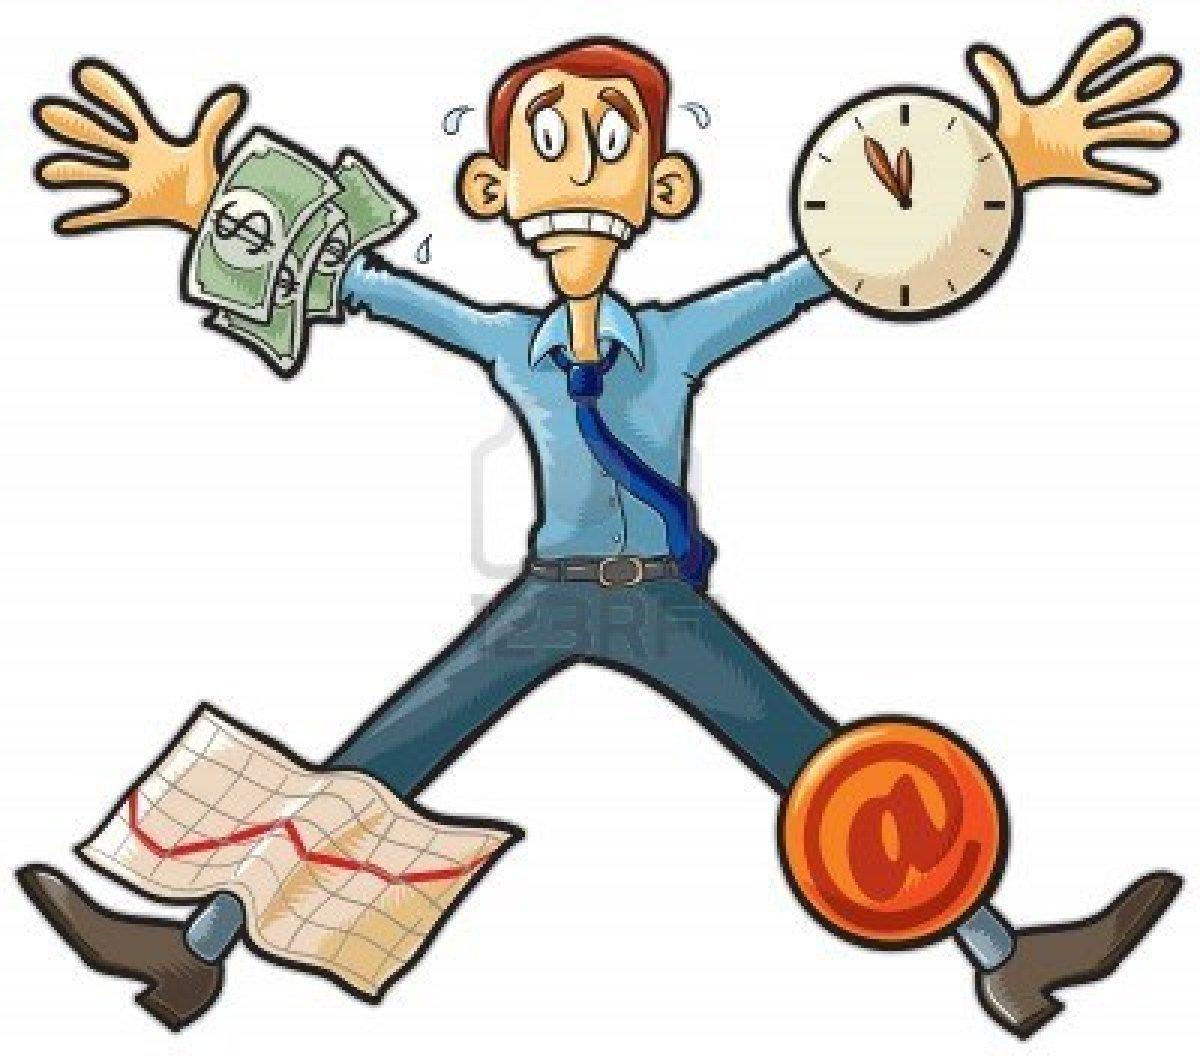 stress-clipart-work-stress-free-clipart-1.jpg